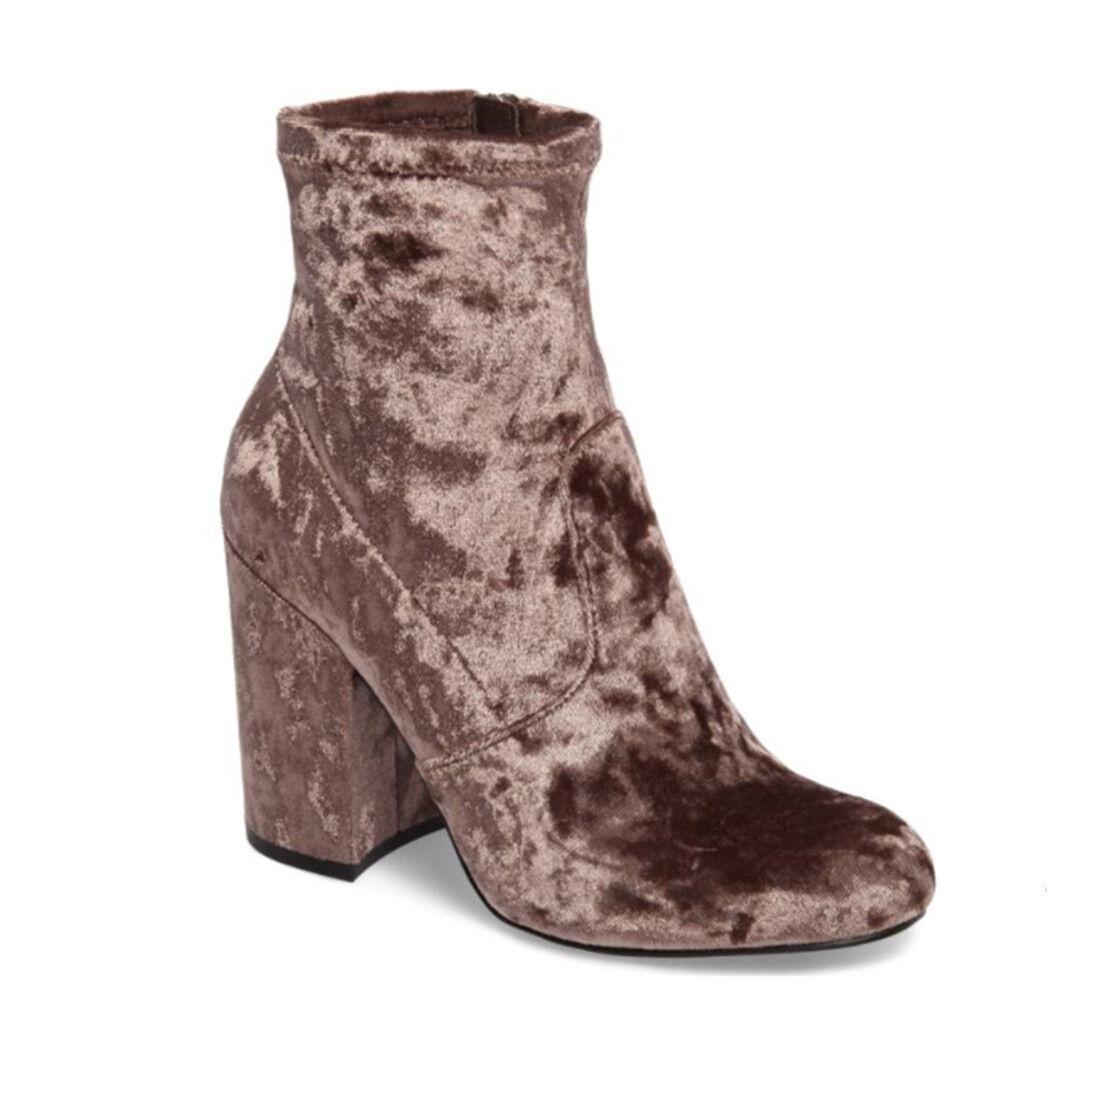 Steve Madden Women's  120 Gaze Ankle Boots (8) Booties shoes Taupe Velvet New